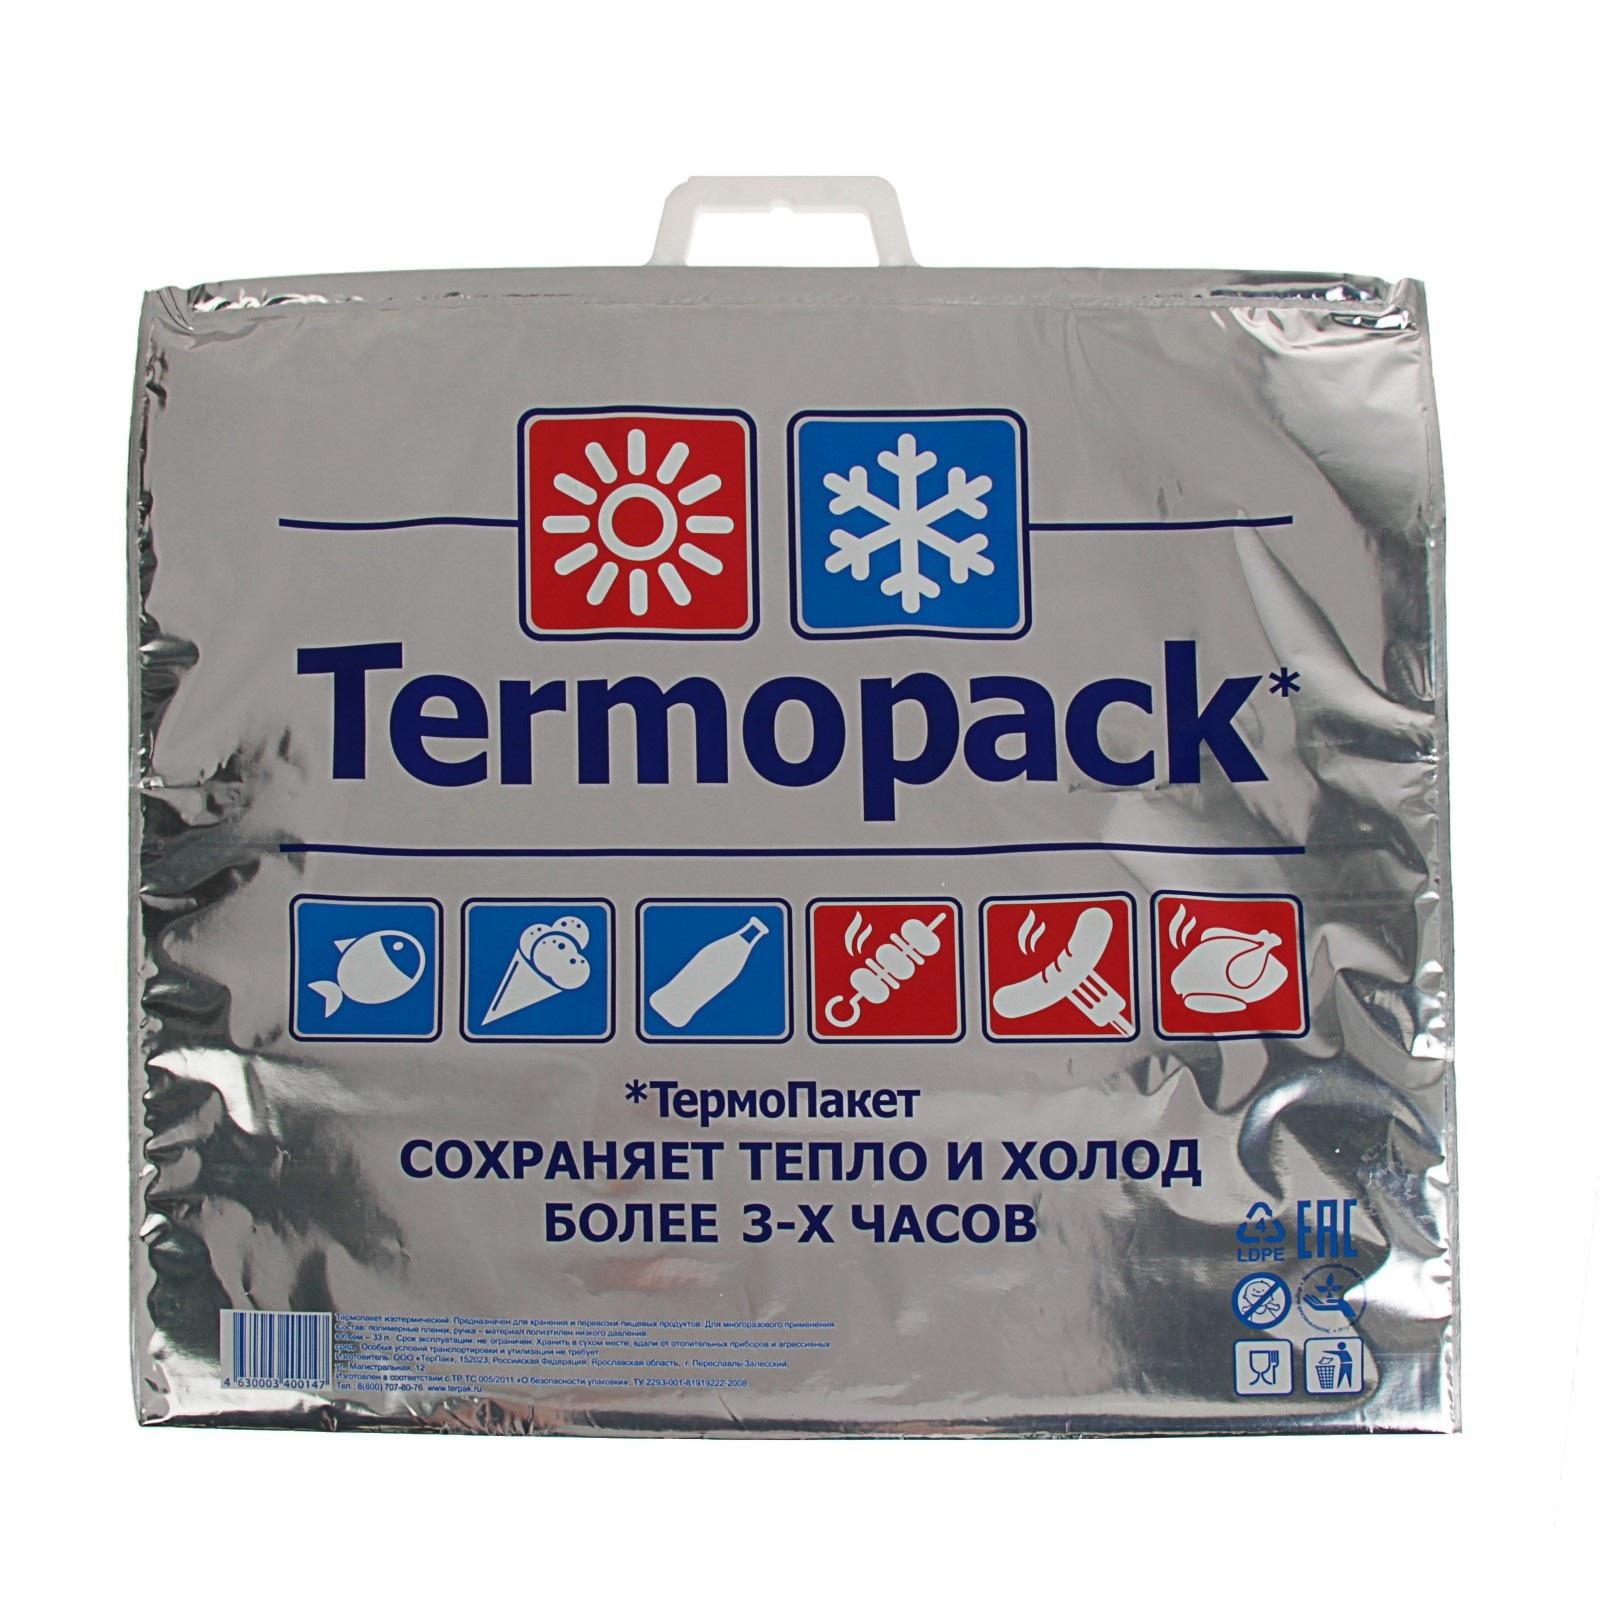 Термопакет эконом, 420x450 мм 10 шт